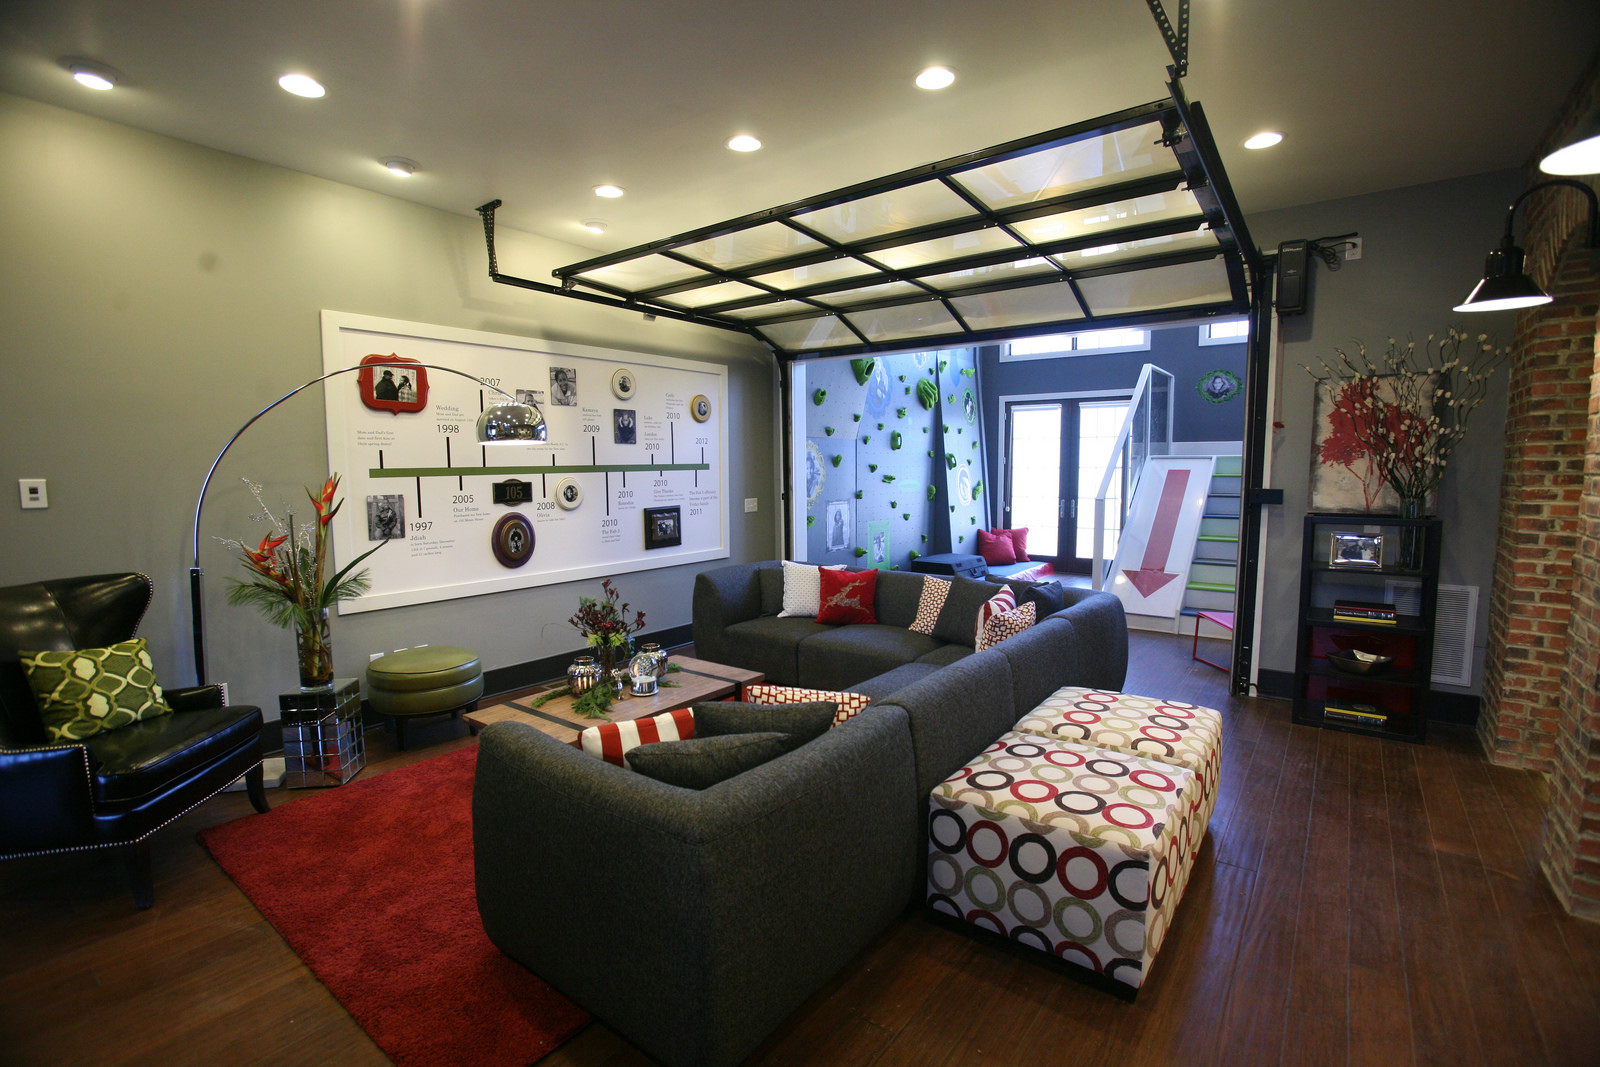 Amazing architecture pics cane jason for Custom house charlotte